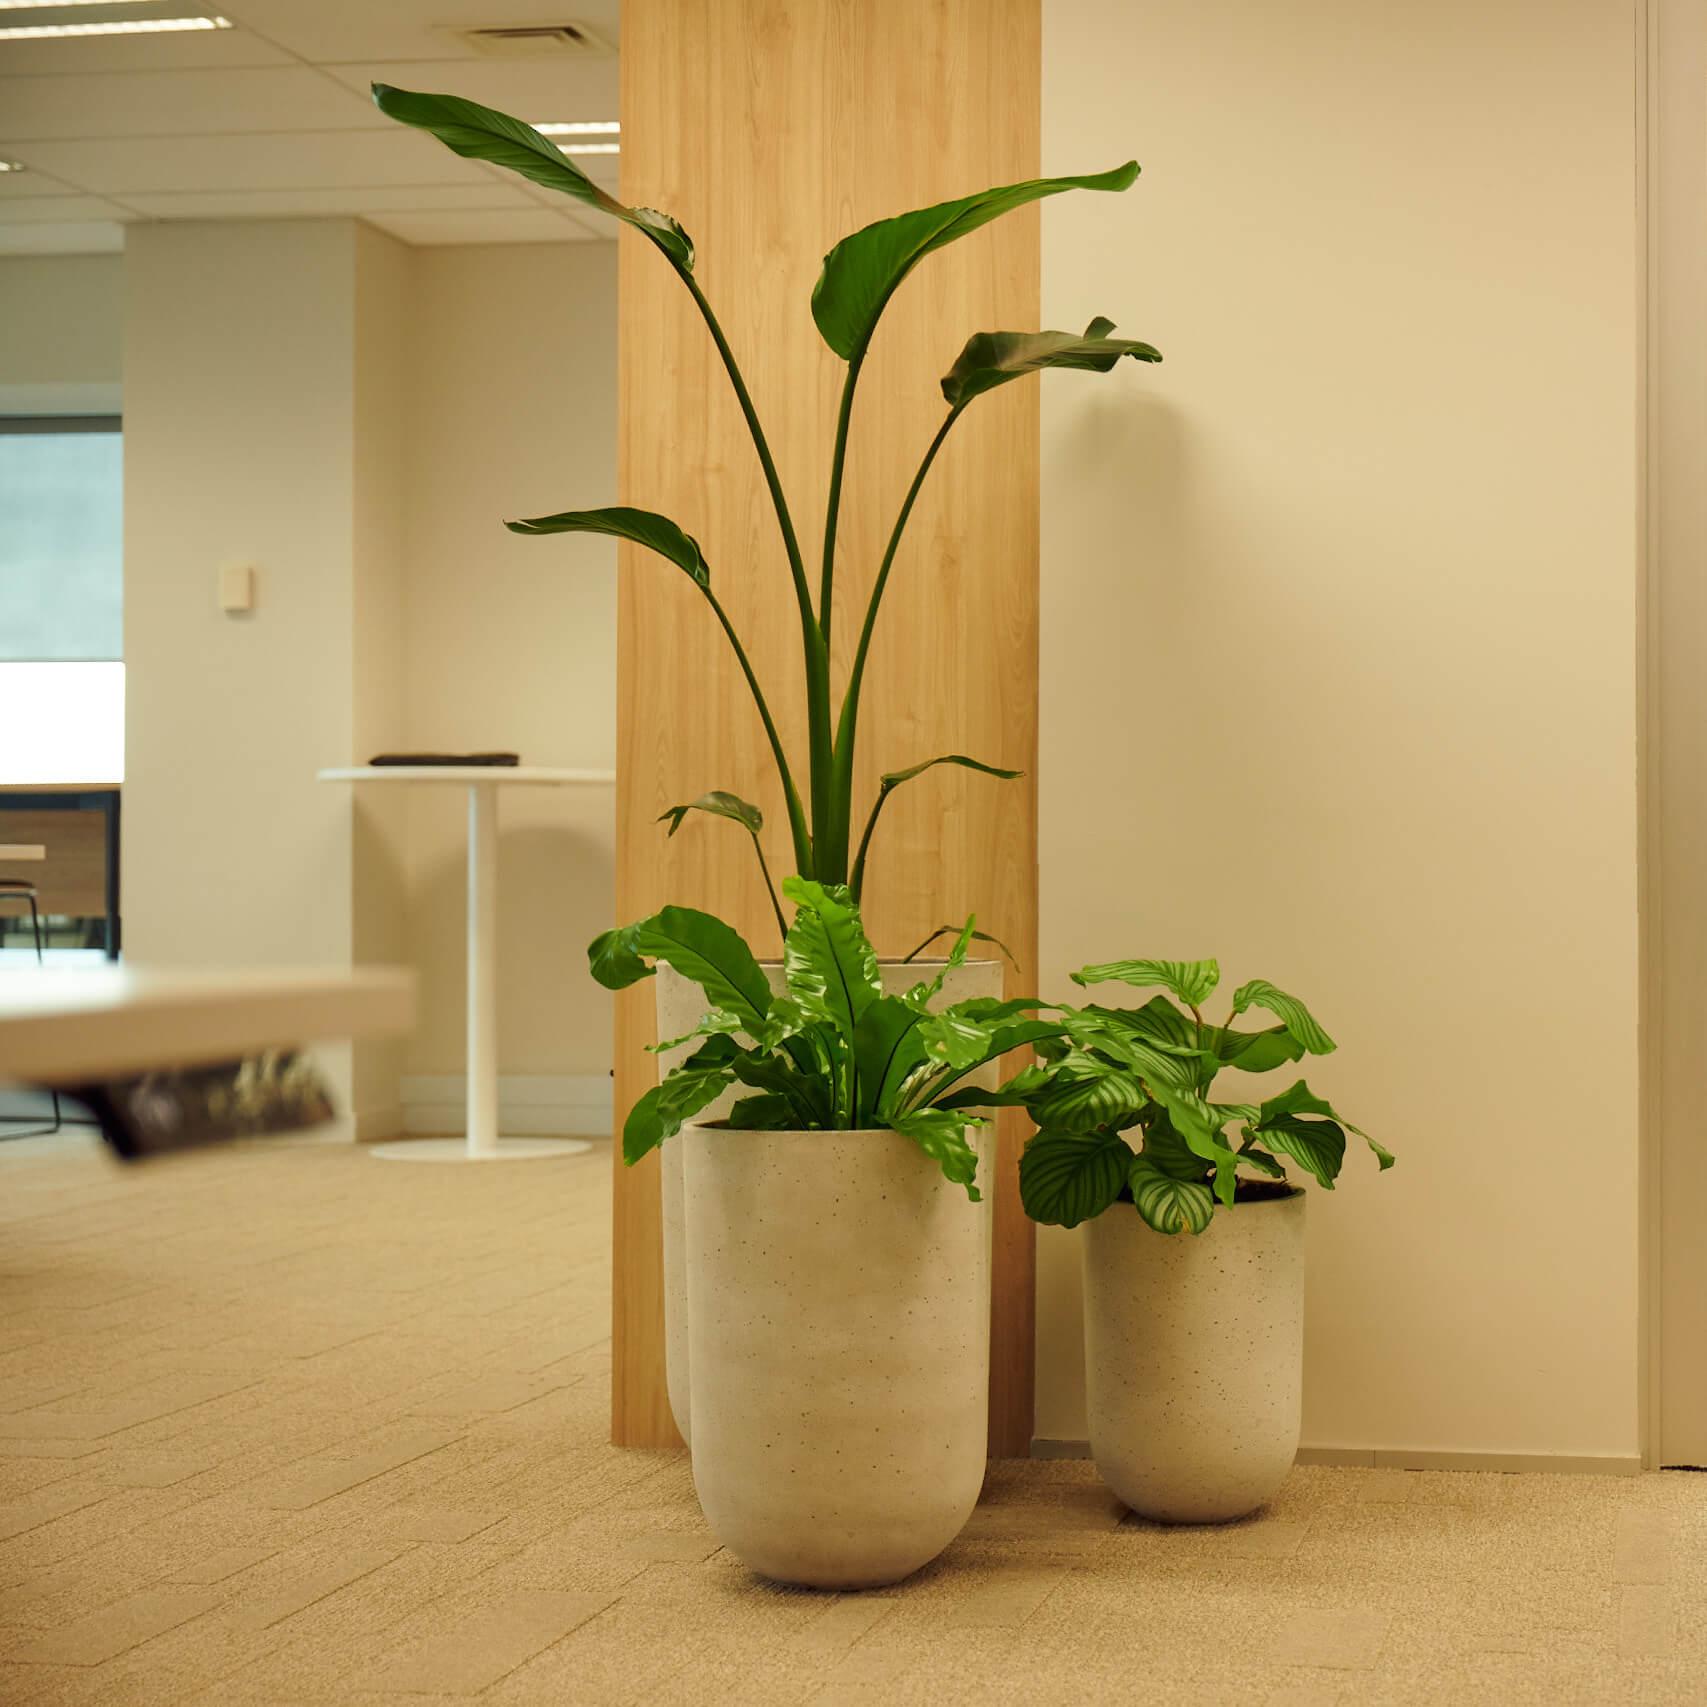 portfolio-offices-spaces-martinjenkins-image5